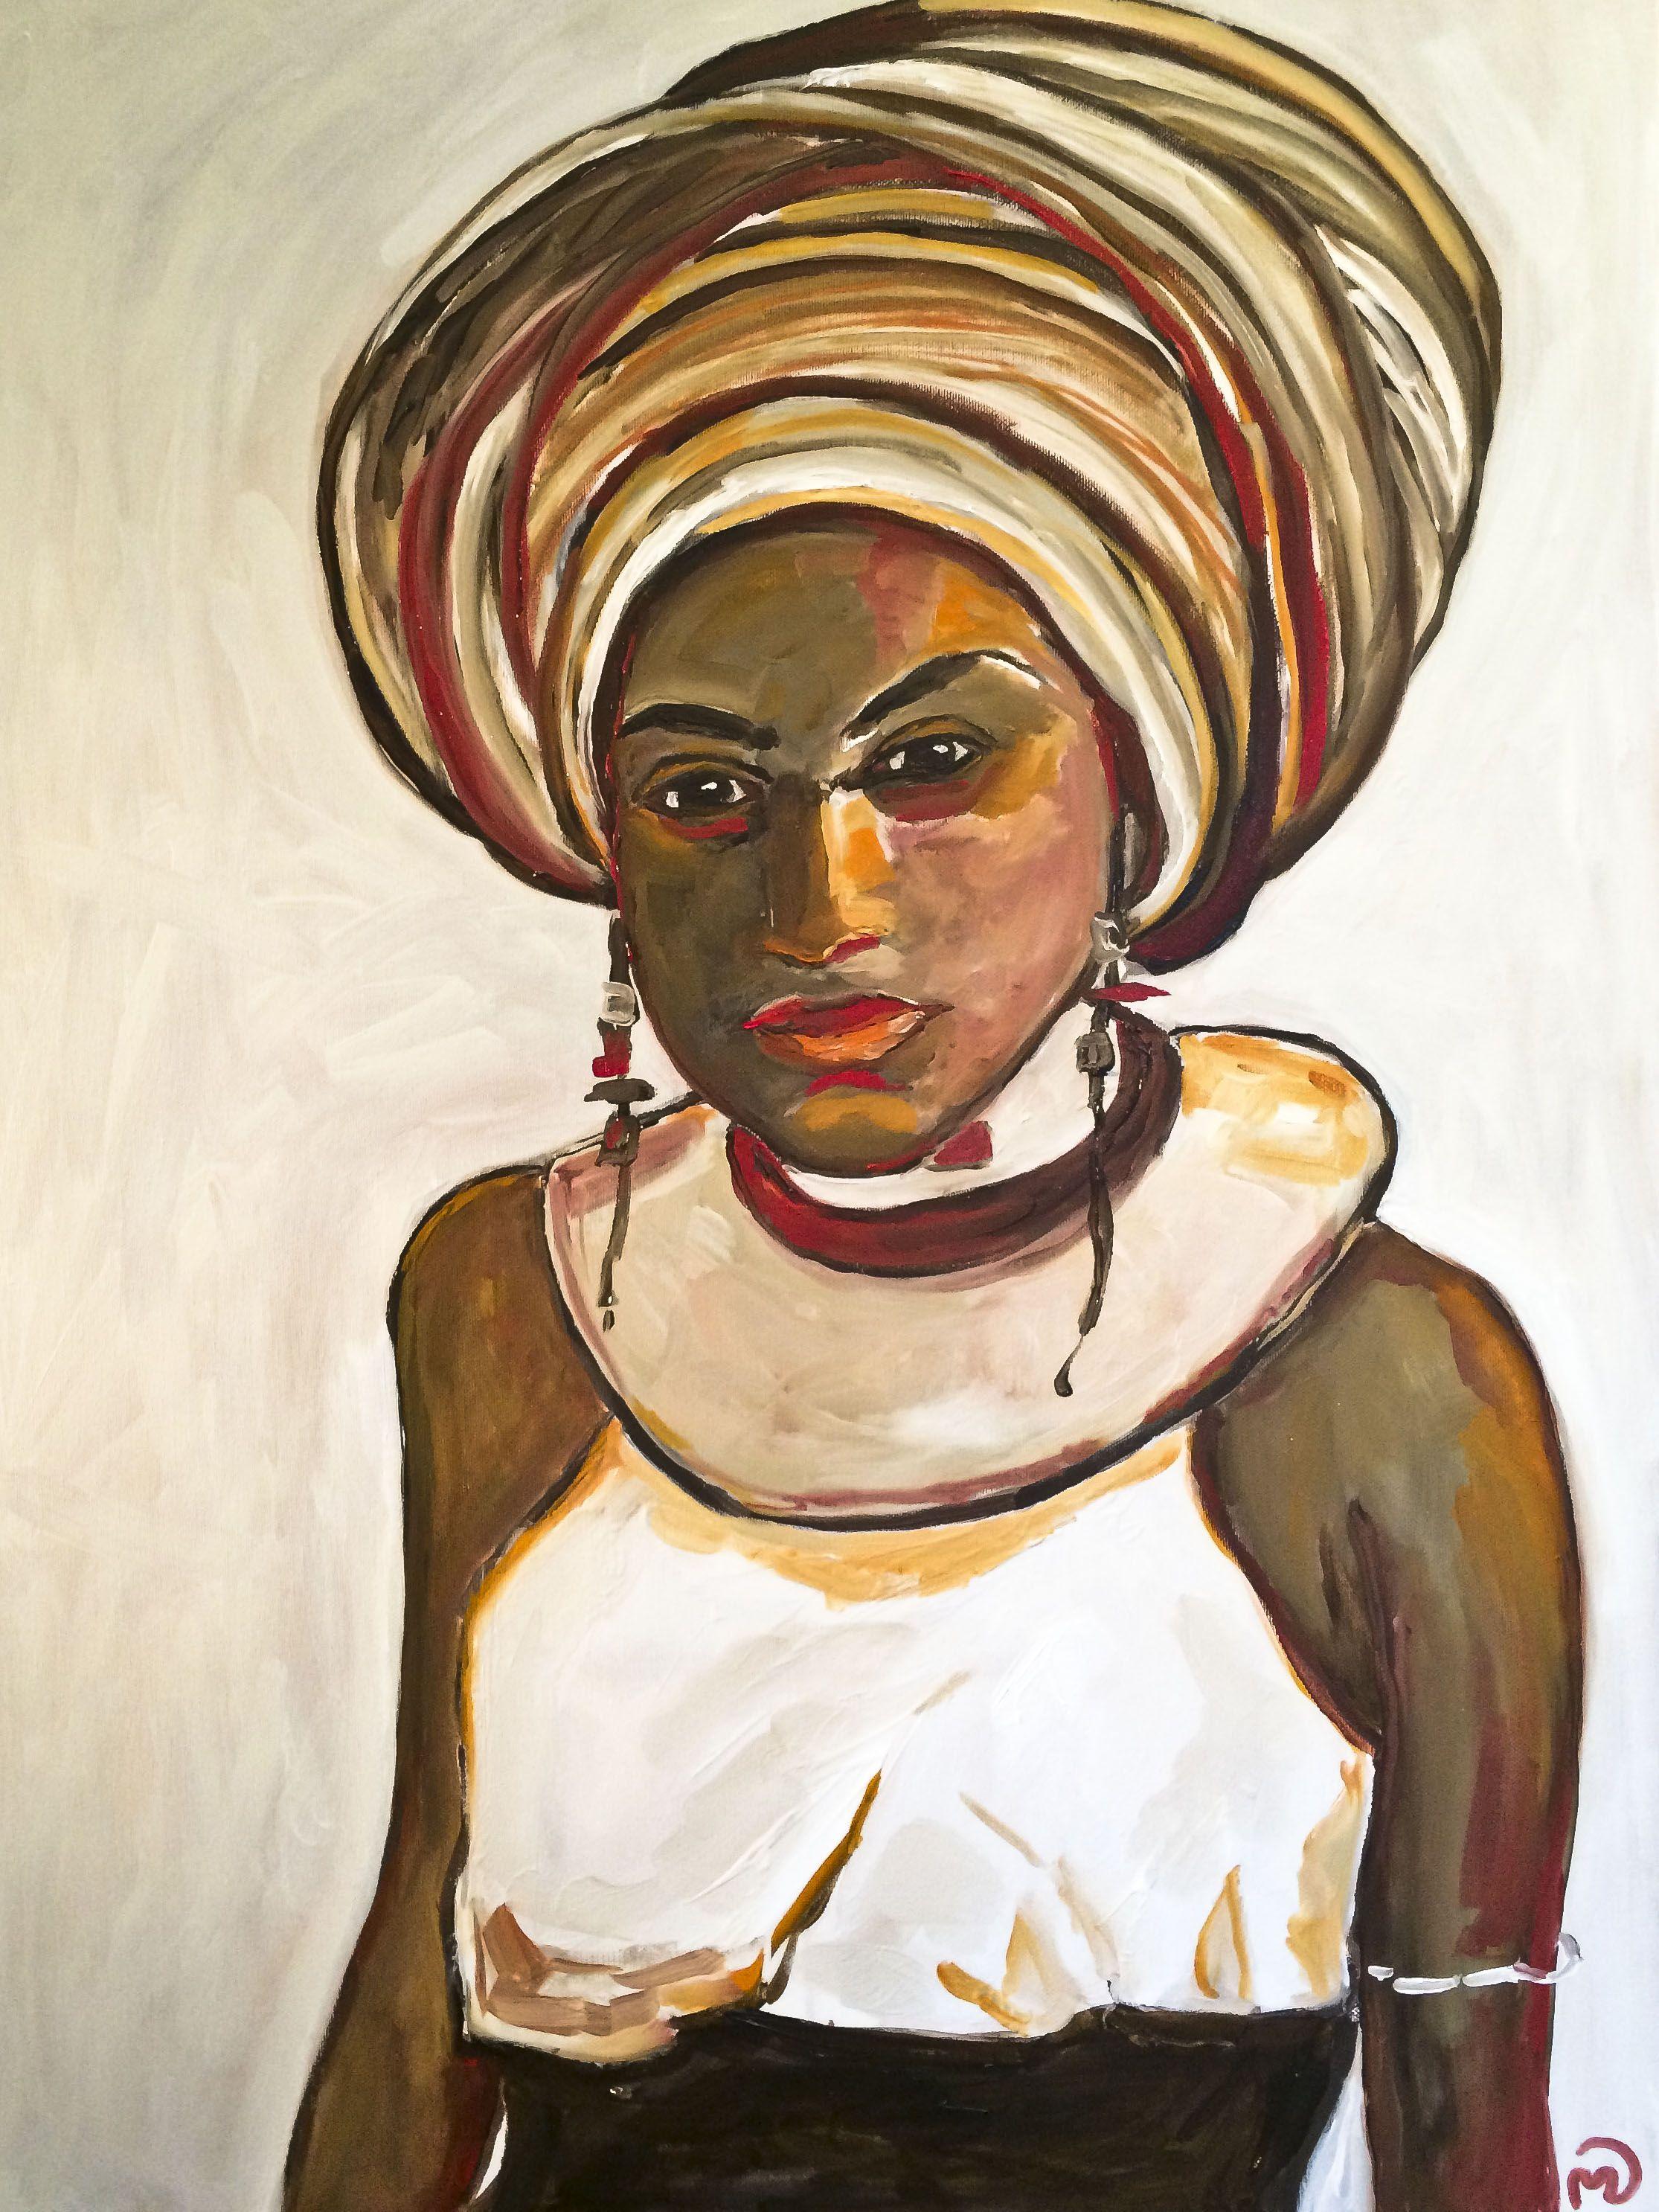 Meisie - oil 60x80cms by Vodegel SOLD #oil #canvas #art #paintings #buy